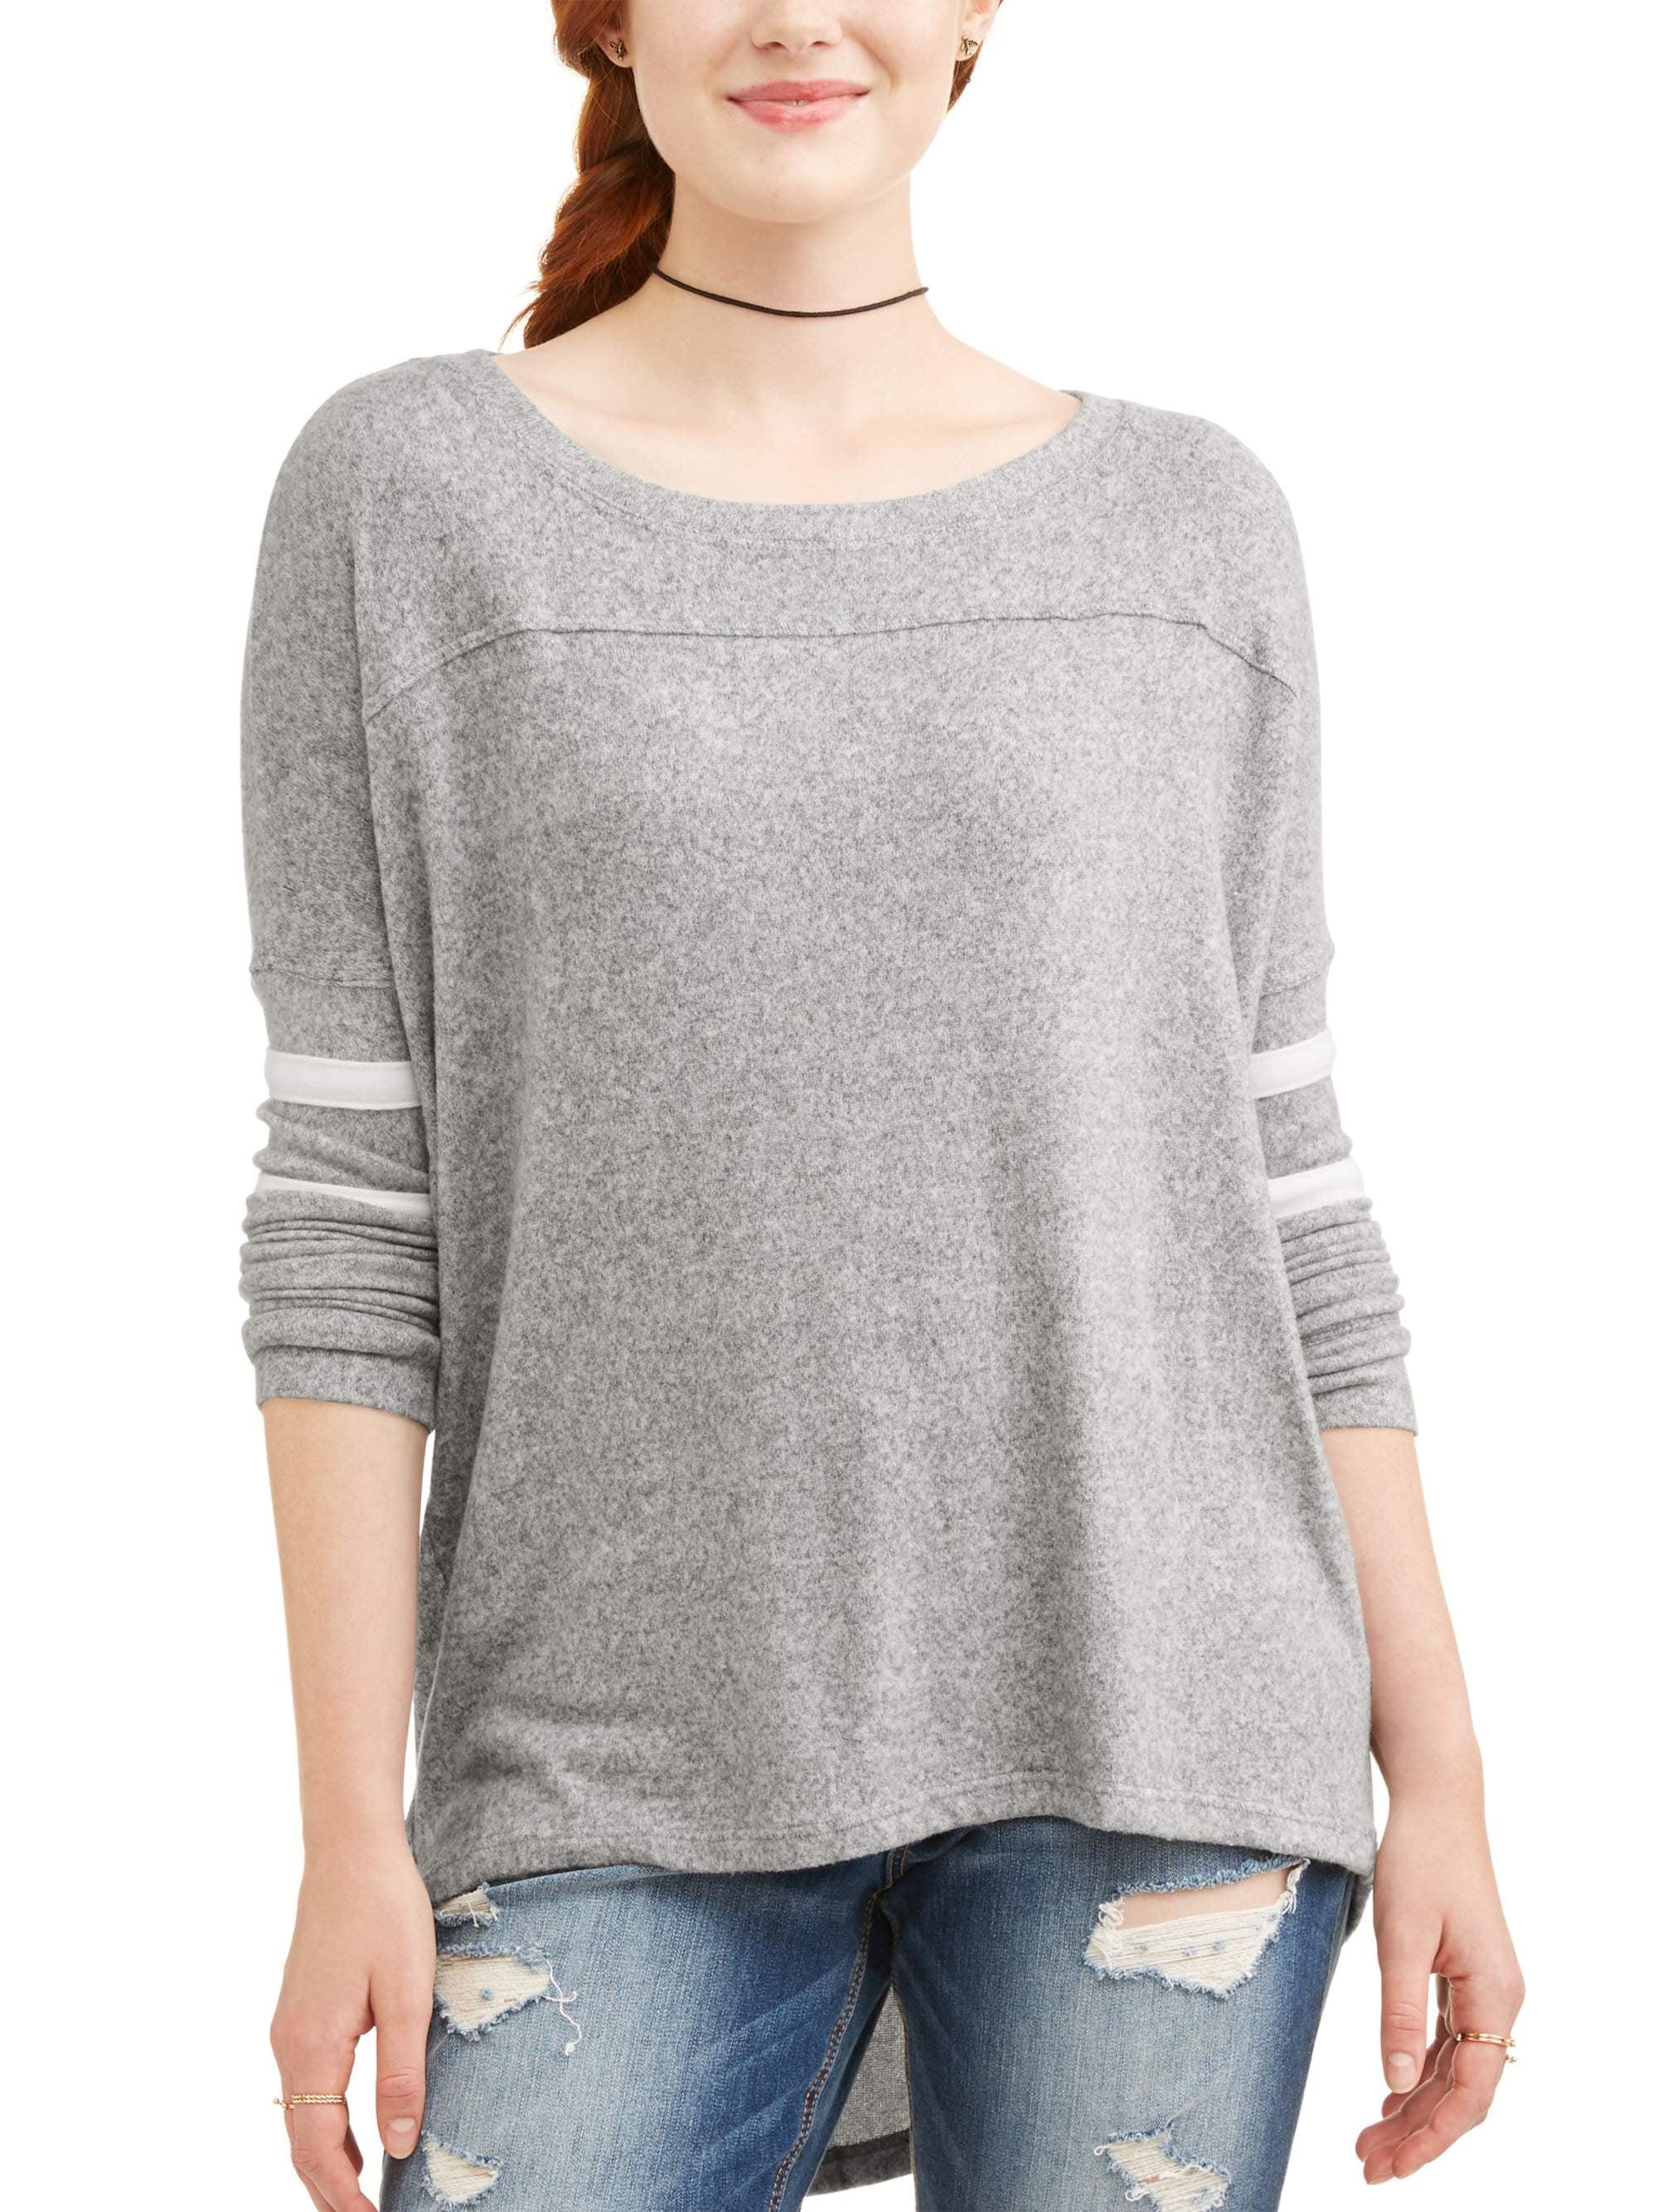 POOF-Slinky Juniors' Varsity Stripe Long Sleeve Tunic Sweater